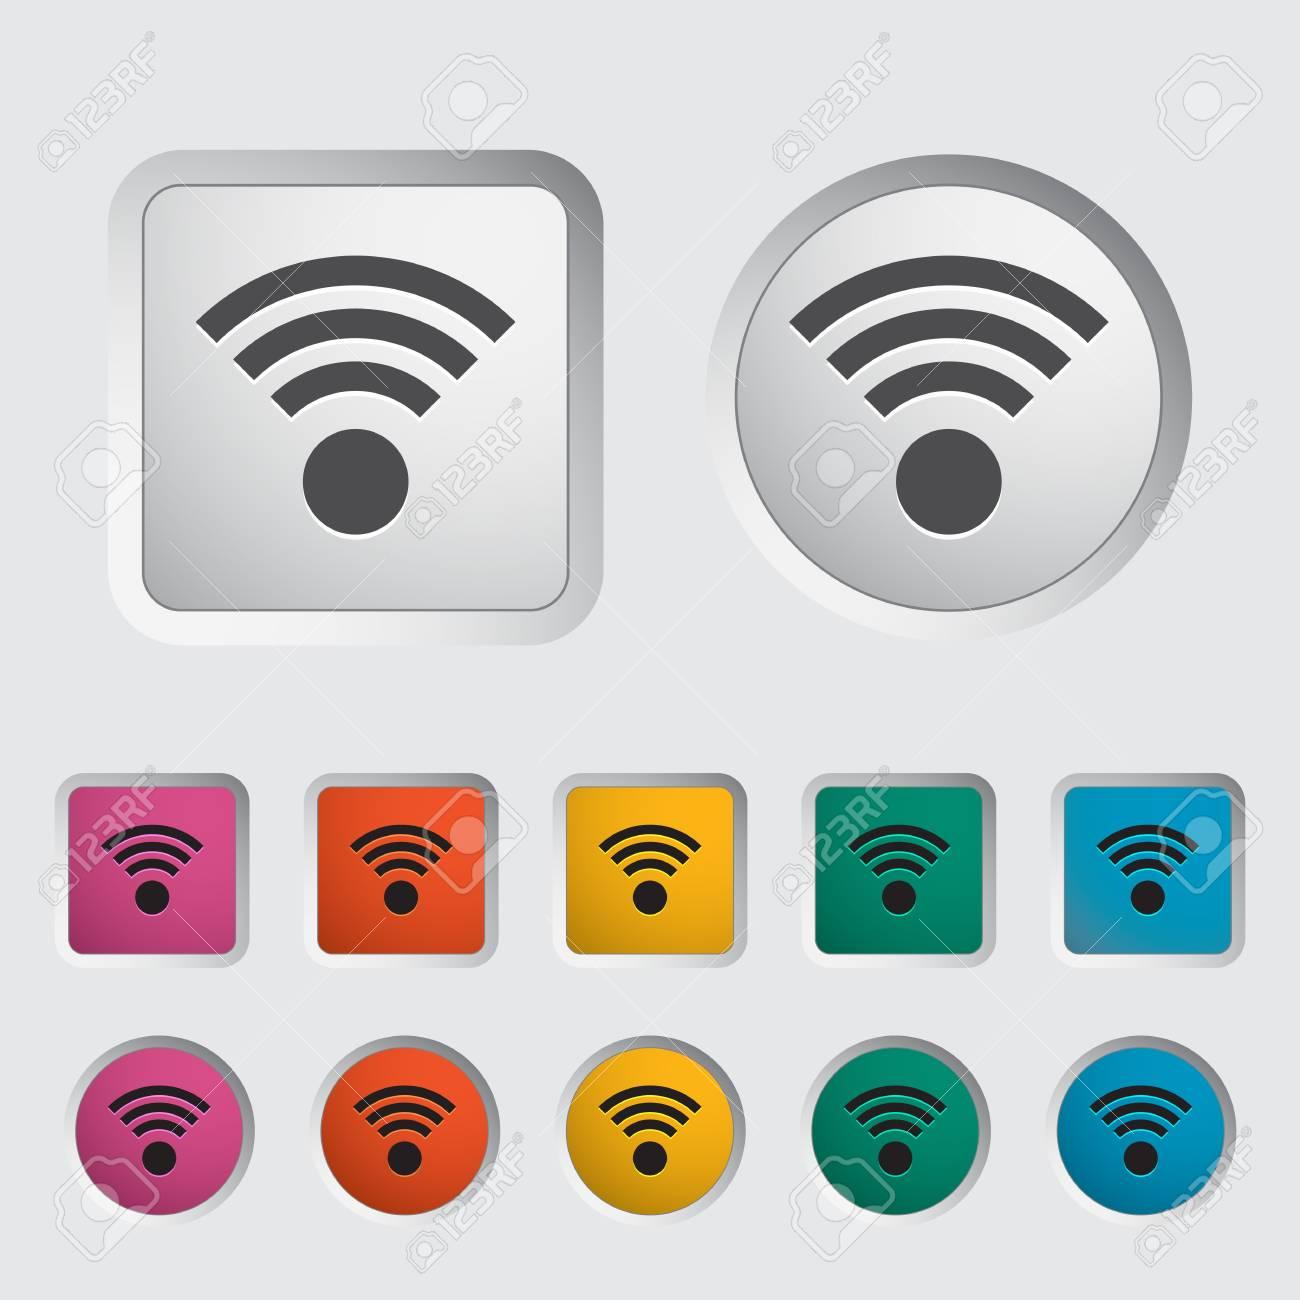 Wireless icon  Vector illustration Stock Vector - 16786608